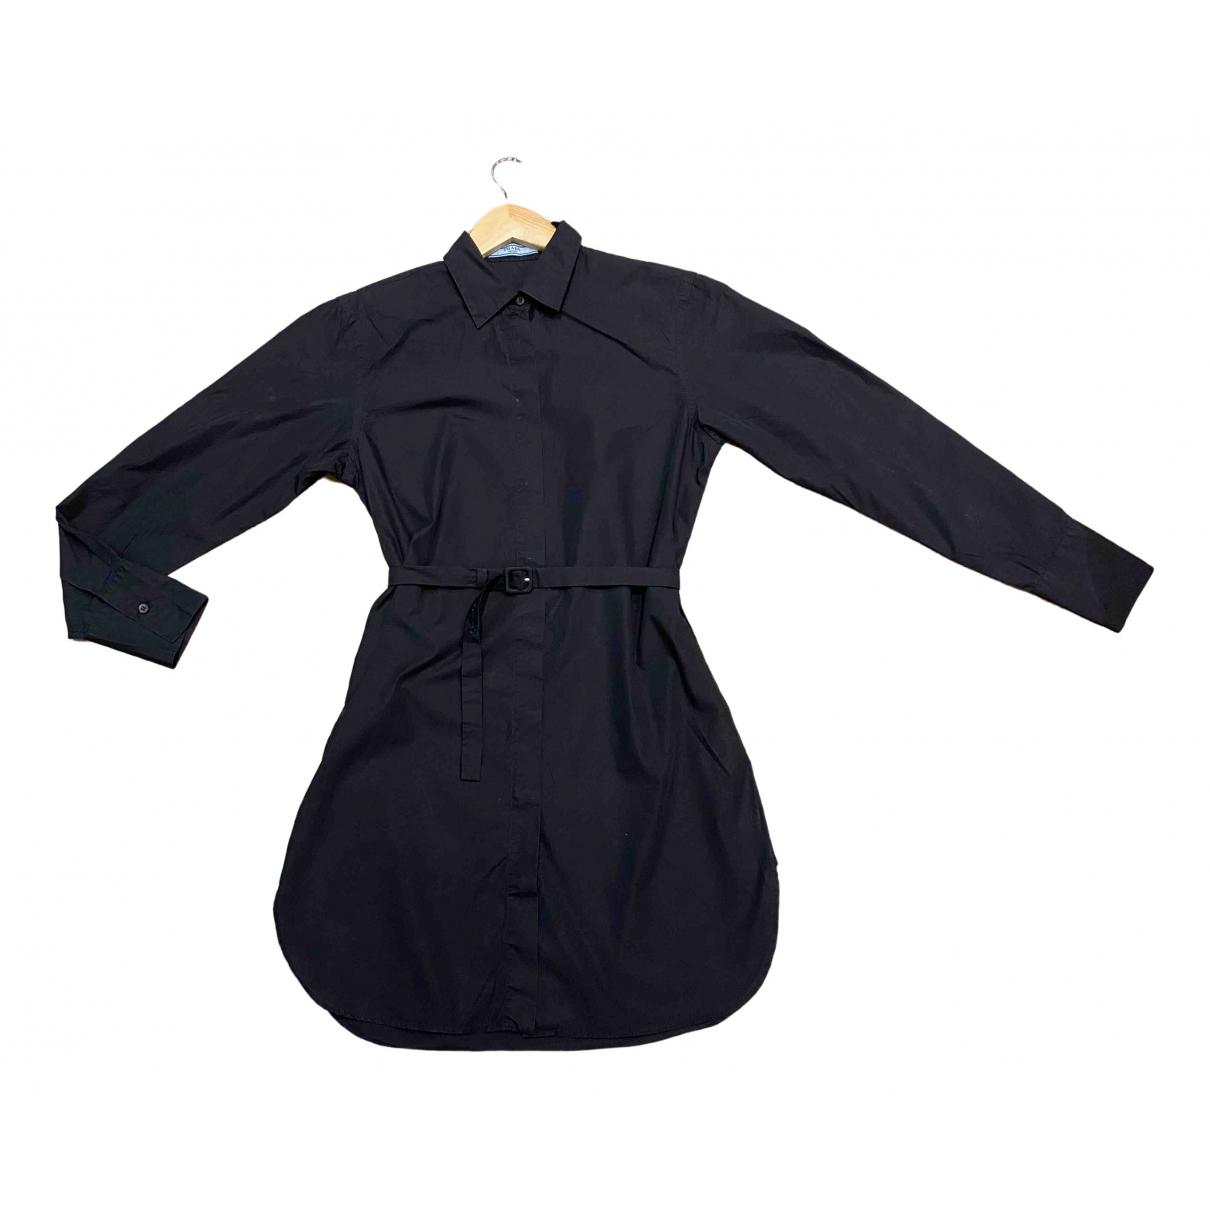 Prada \N Black Cotton dress for Women 40 IT